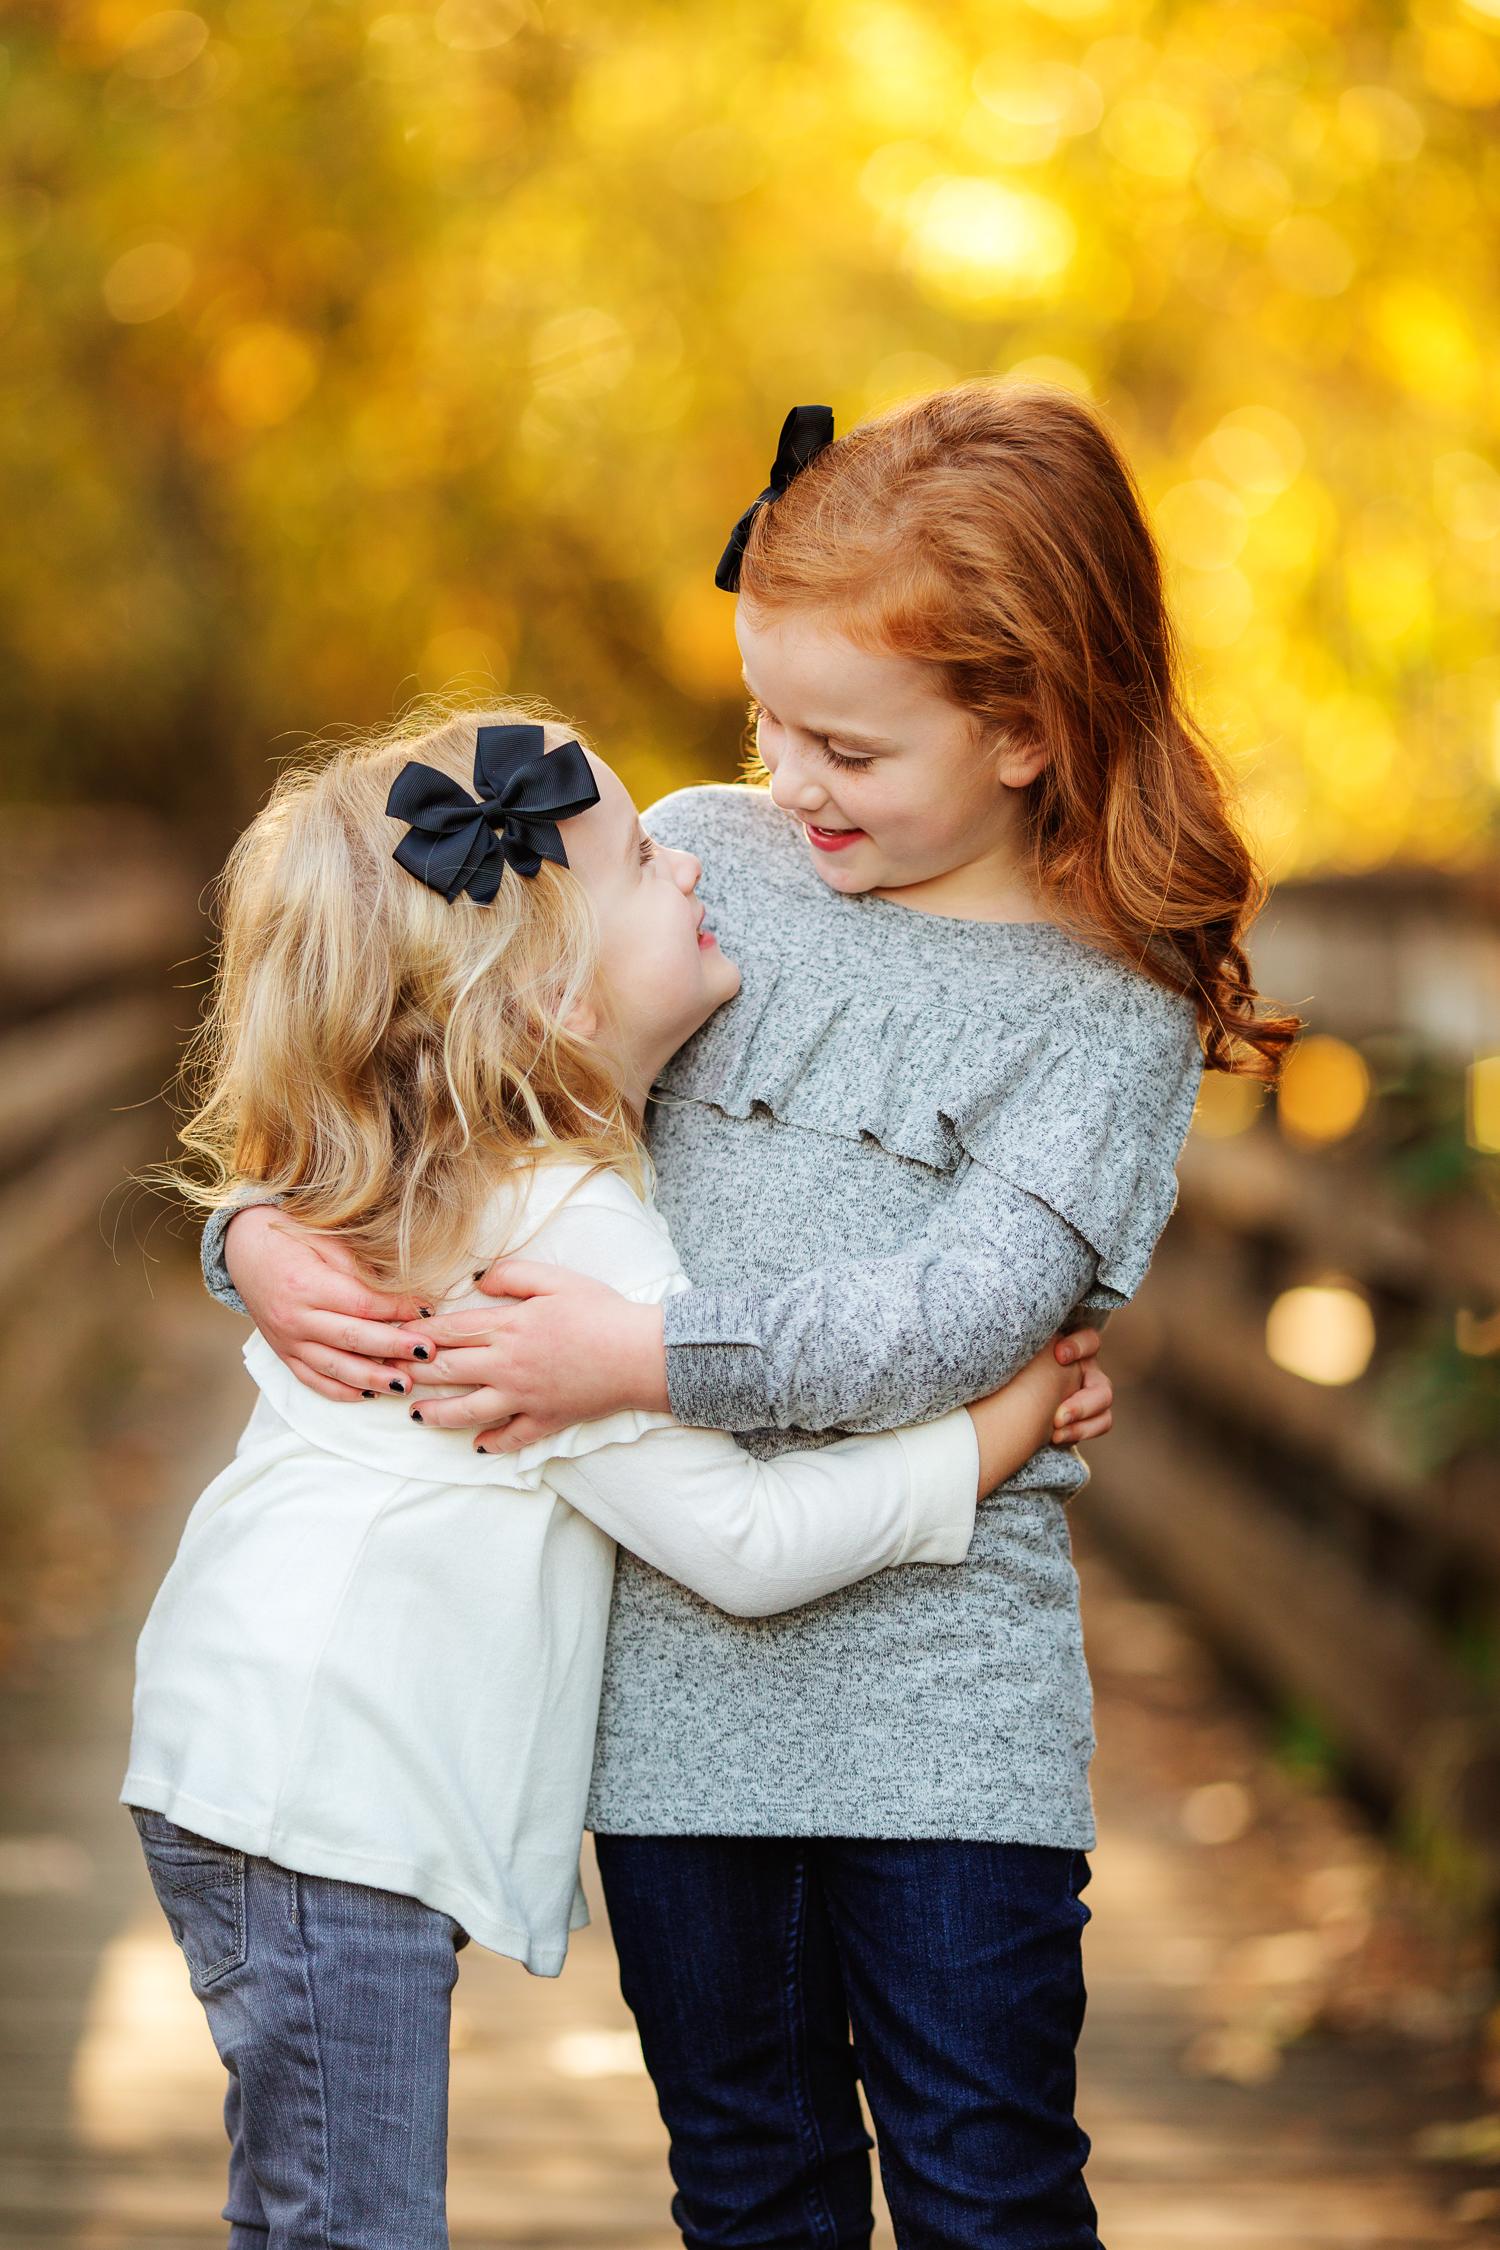 ariellanoellephotography-family-portrait-session-fall-mini-photographer-seniors-highschool-portraiture-child-photographer-1-7.jpg